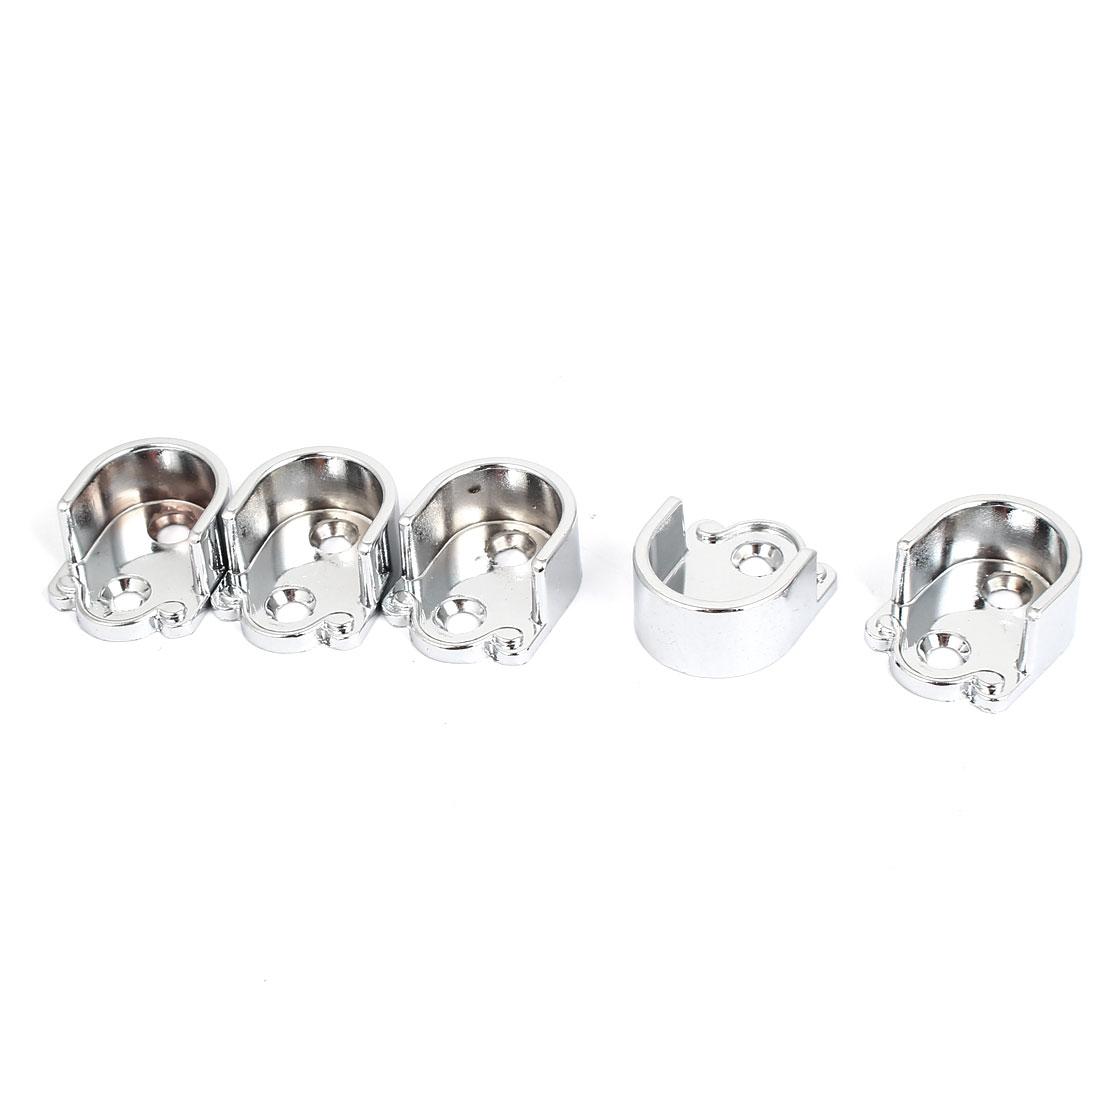 Metal 19mm Dia Clothes Closet Rod Flange Holder Bracket Silver Tone 5pcs